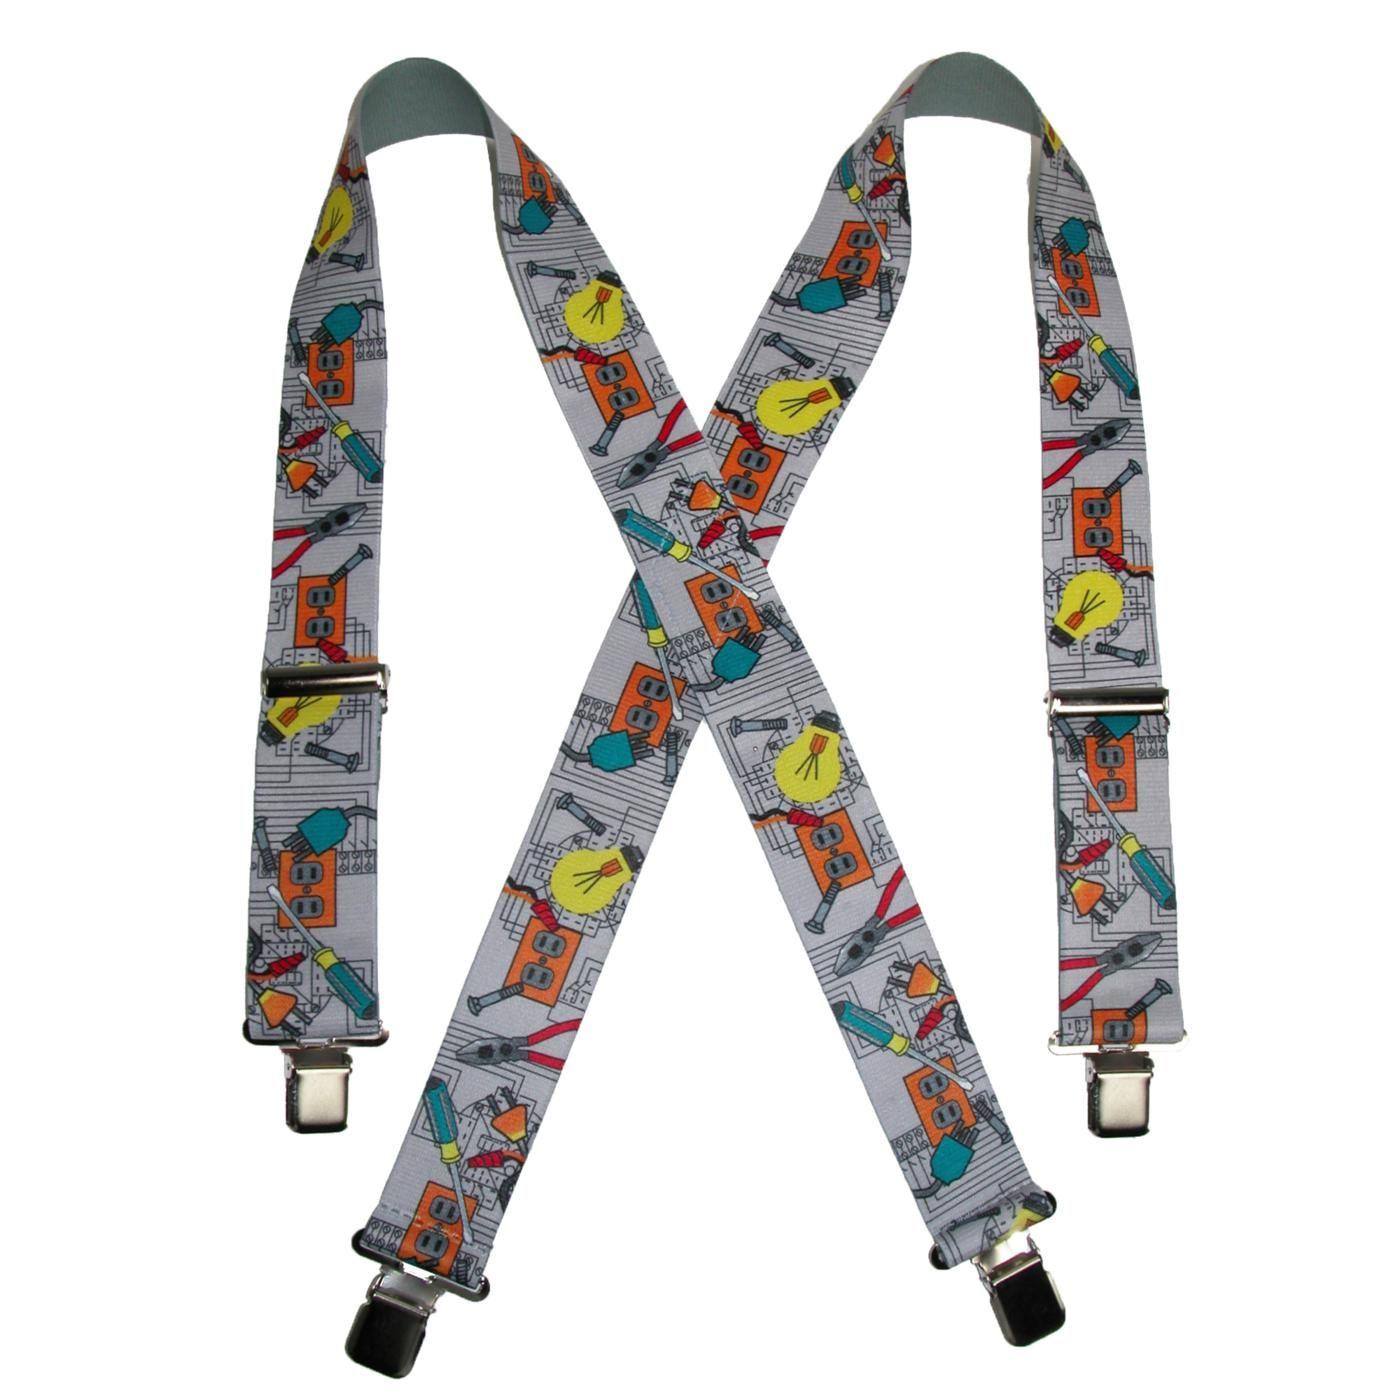 Anniversary Gift Men\u2019s Y-Shaped Suspenders Suit Suspenders Pattern Suspender for Men Elastic Straps 6 Metal Clips Casual Suspenders